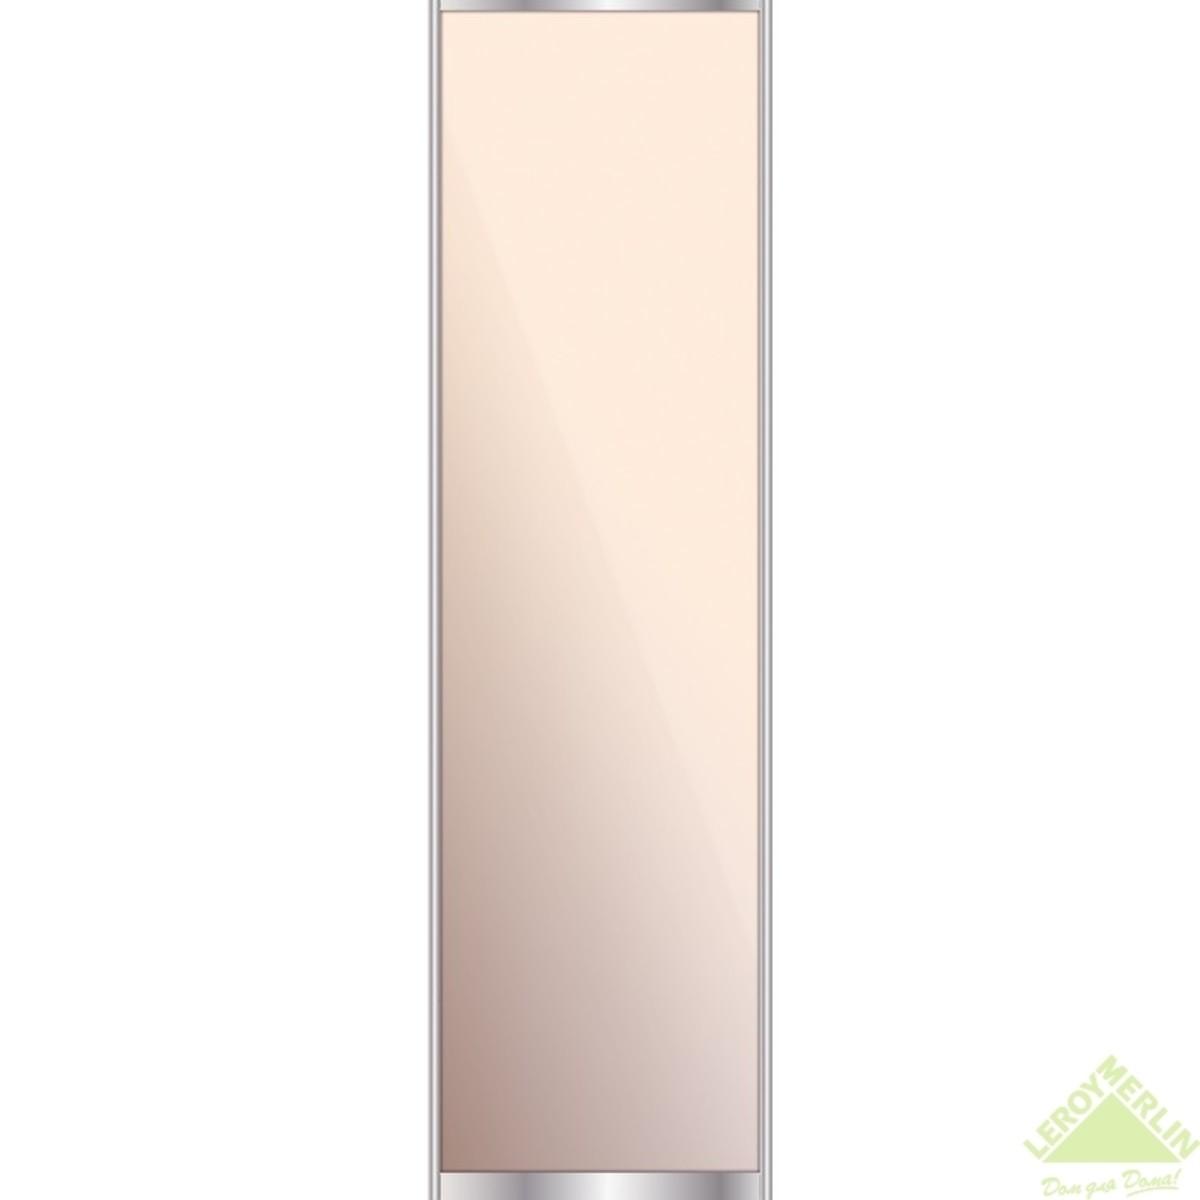 Дверь-купе 2595х704 мм зеркало цвет серебро